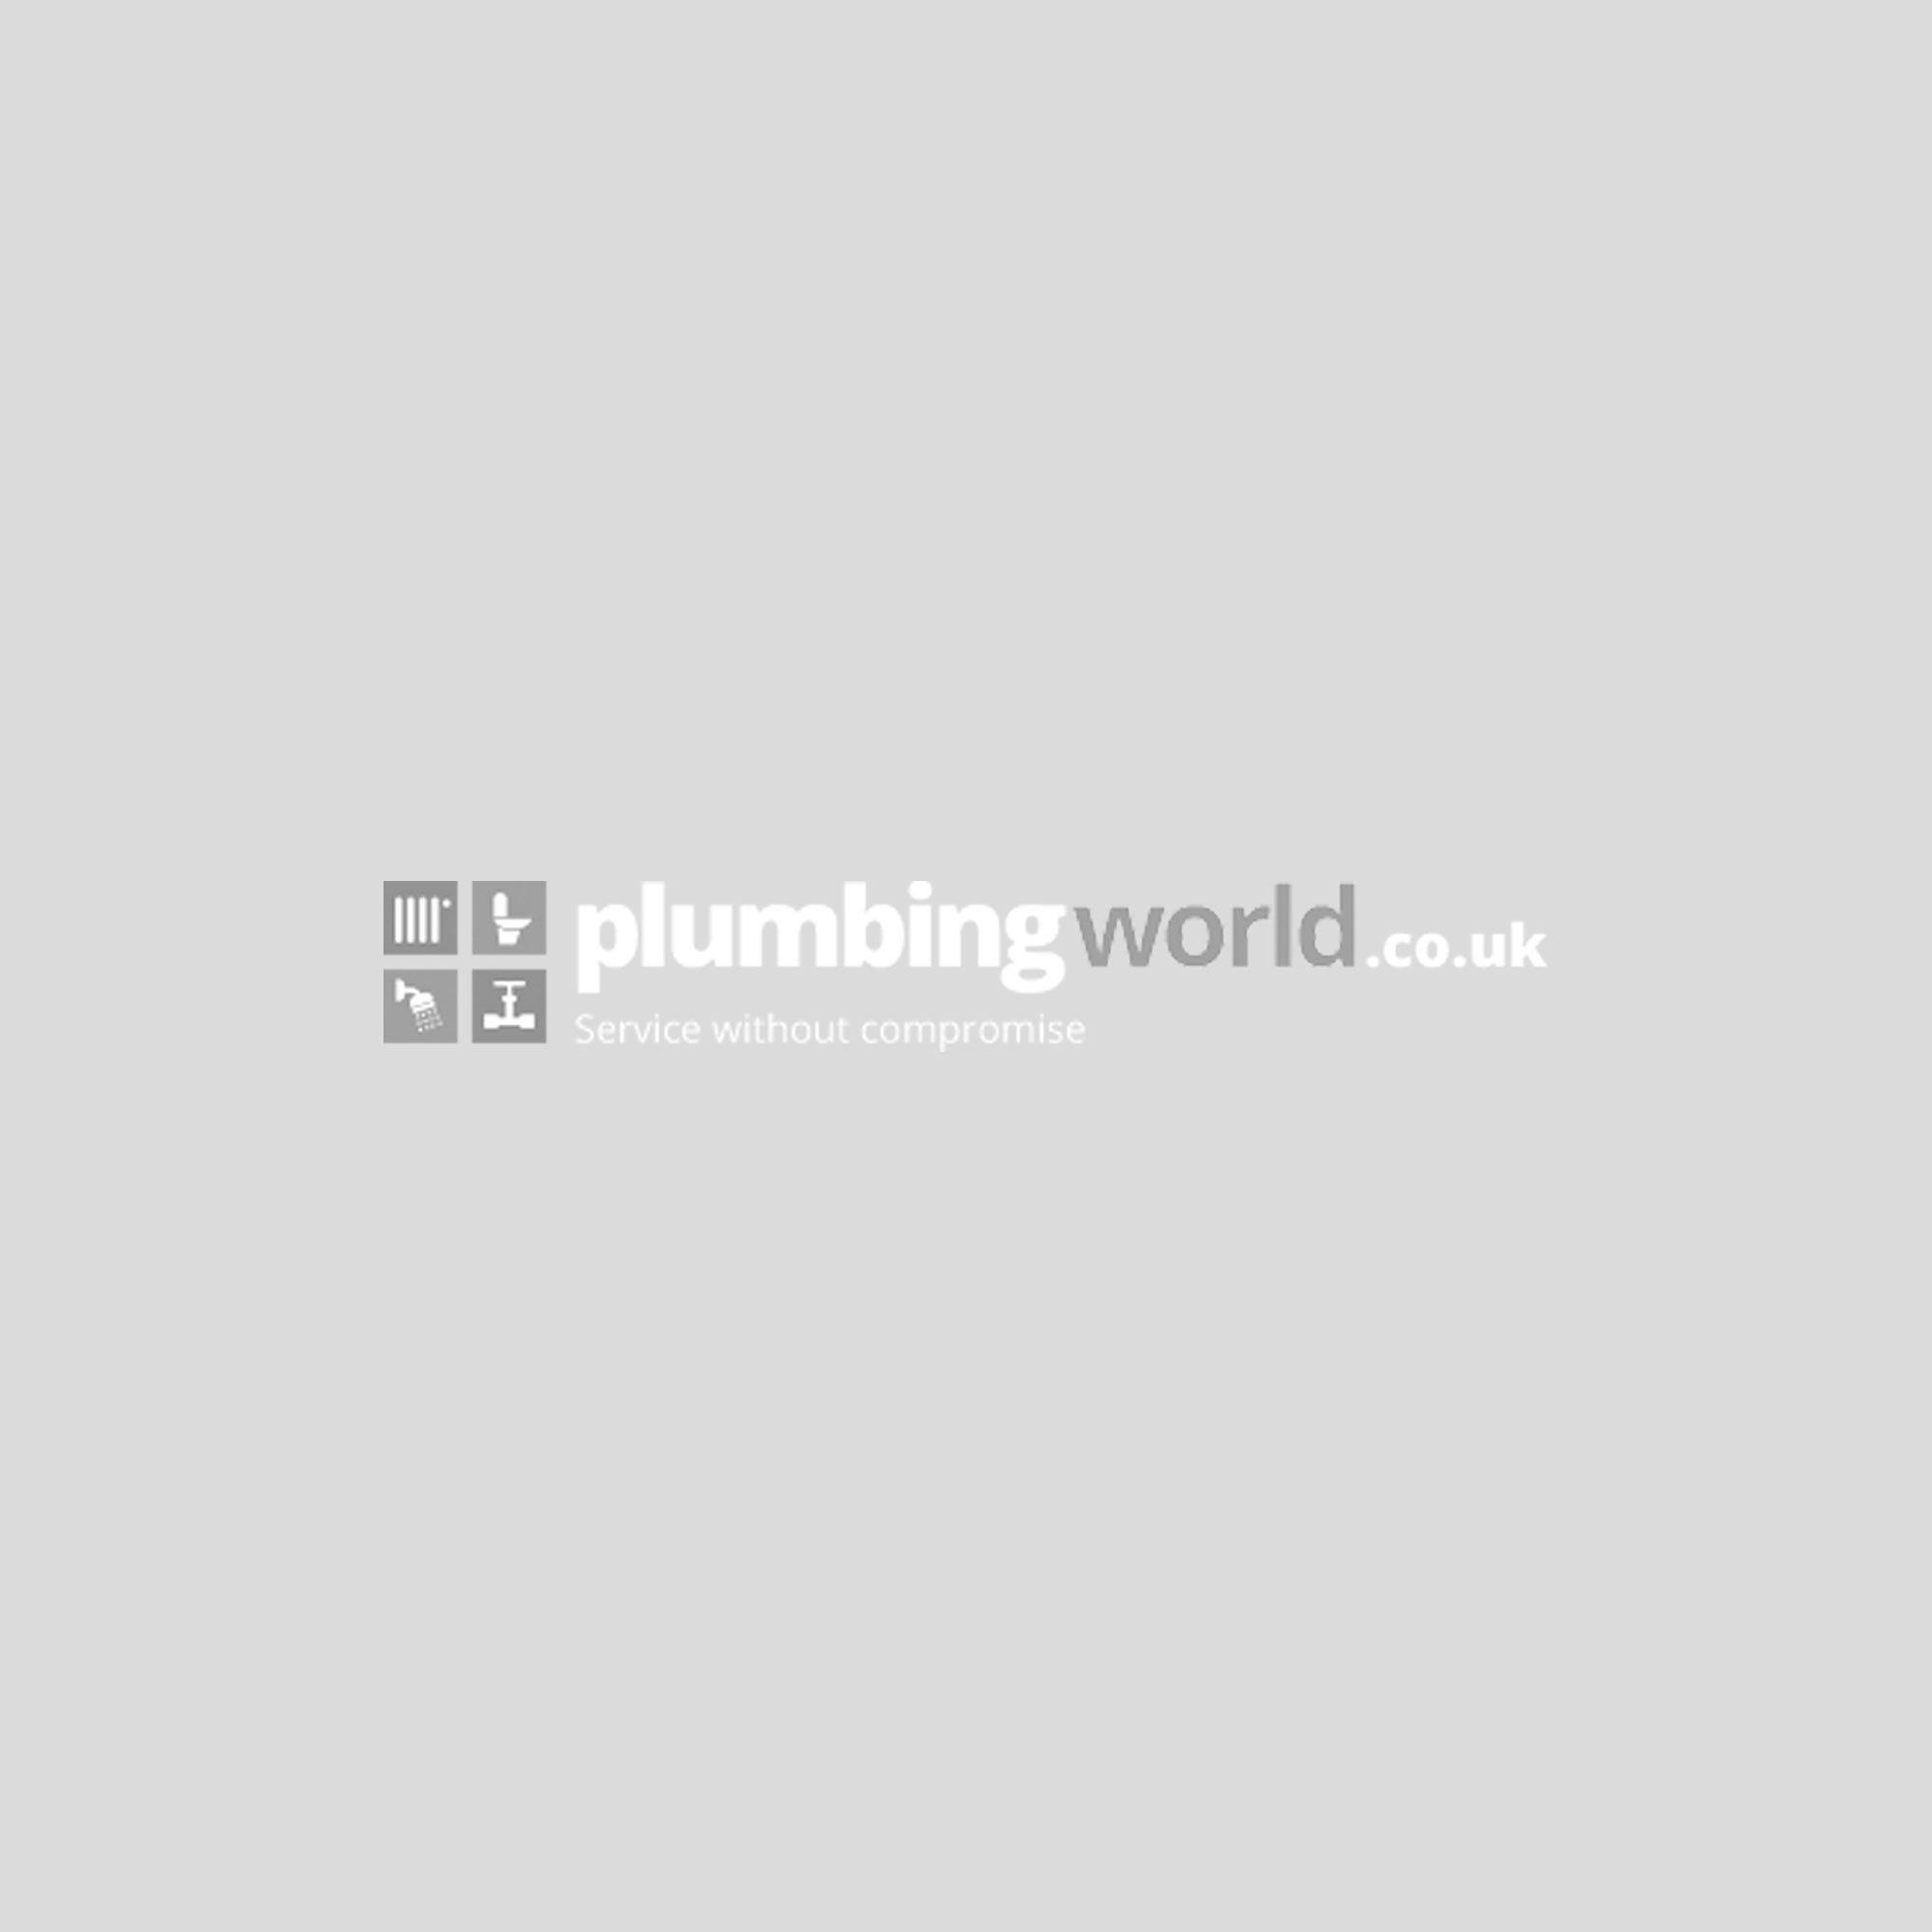 1200mm wide x 2400mm High x 10mm Depth PVC Shower Panel - Weathered Stone Matt